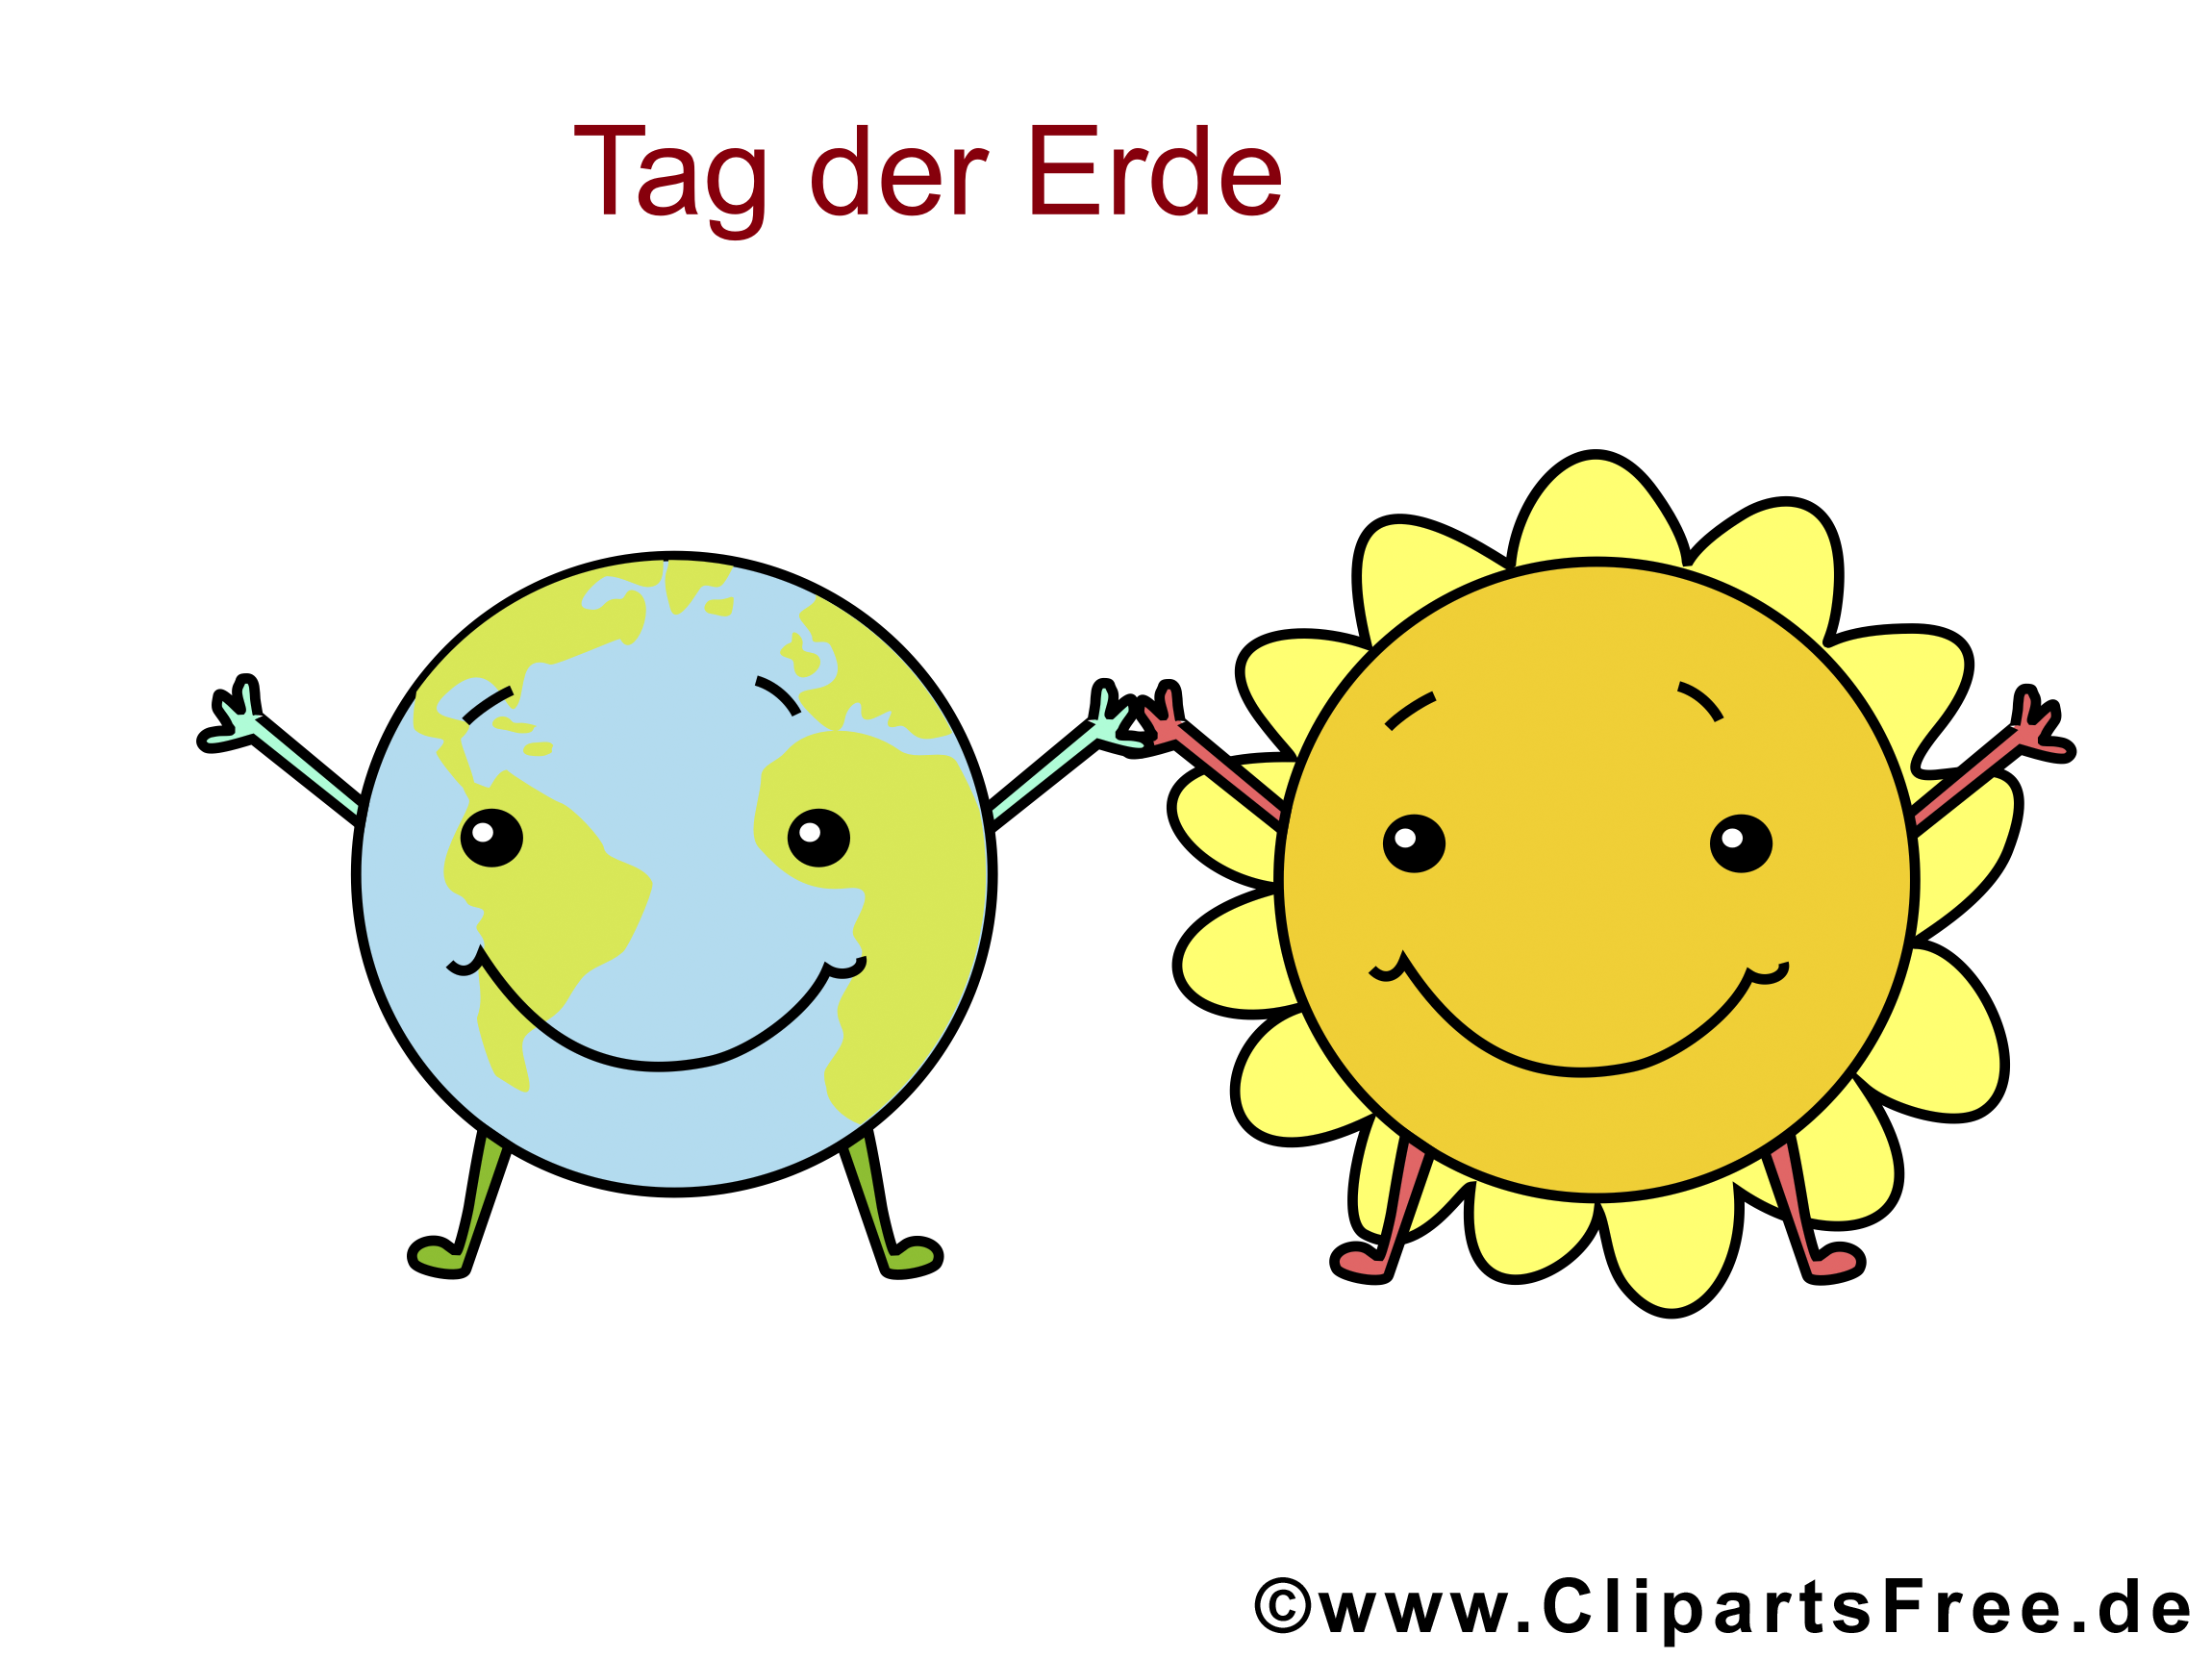 Tag der Erde Clipart, Bild, Illustration, Cartoon, GB Bild